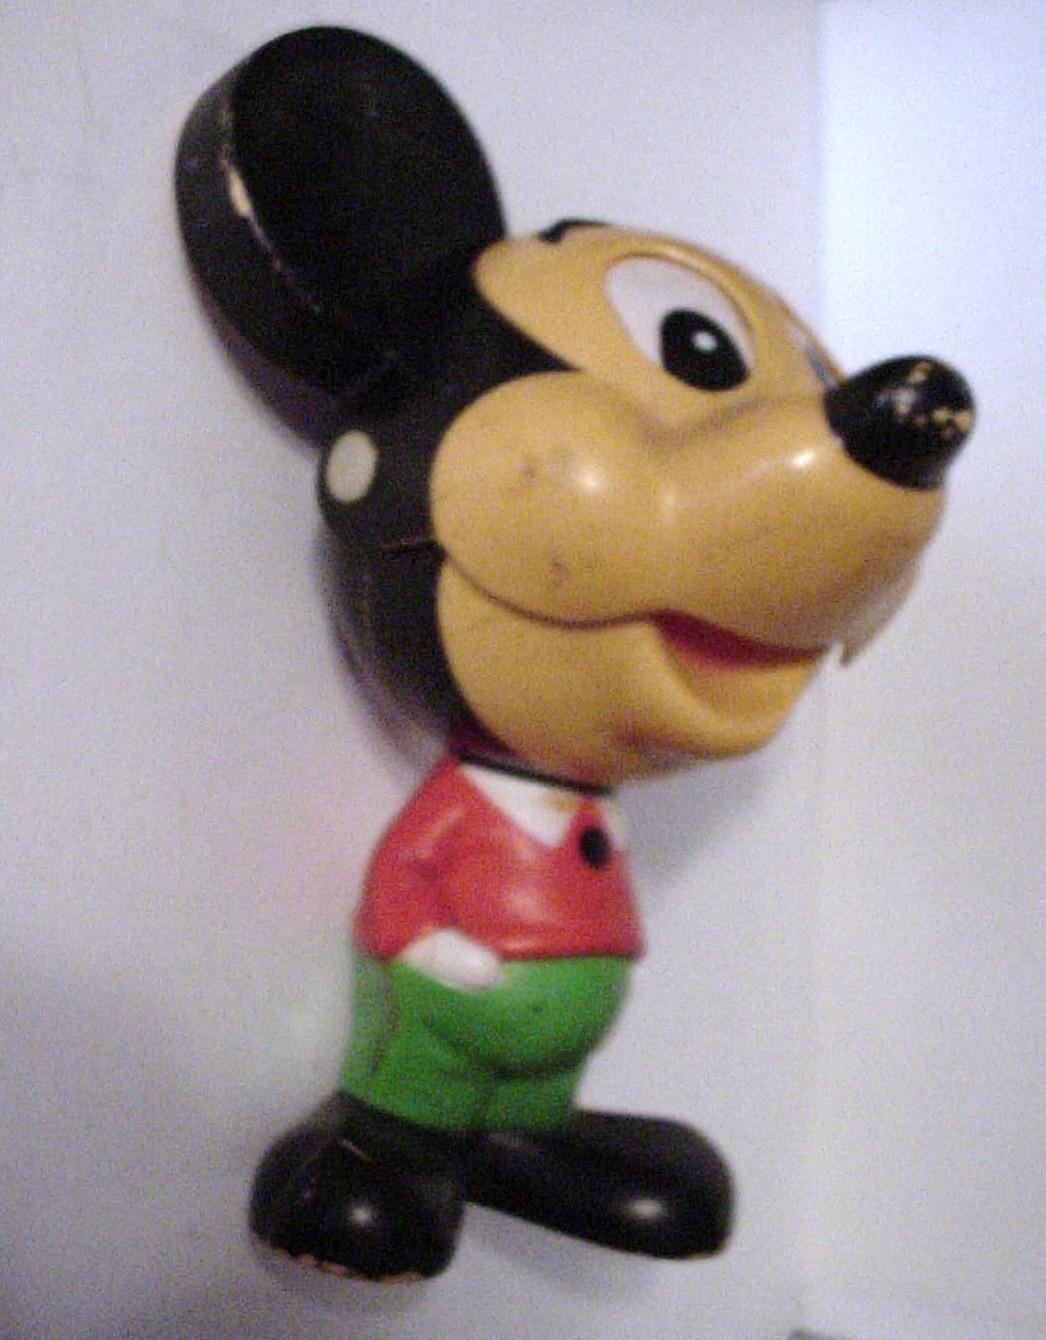 Old Mattel Toys : Vintage mattel talking mickey mouse pull toy toys